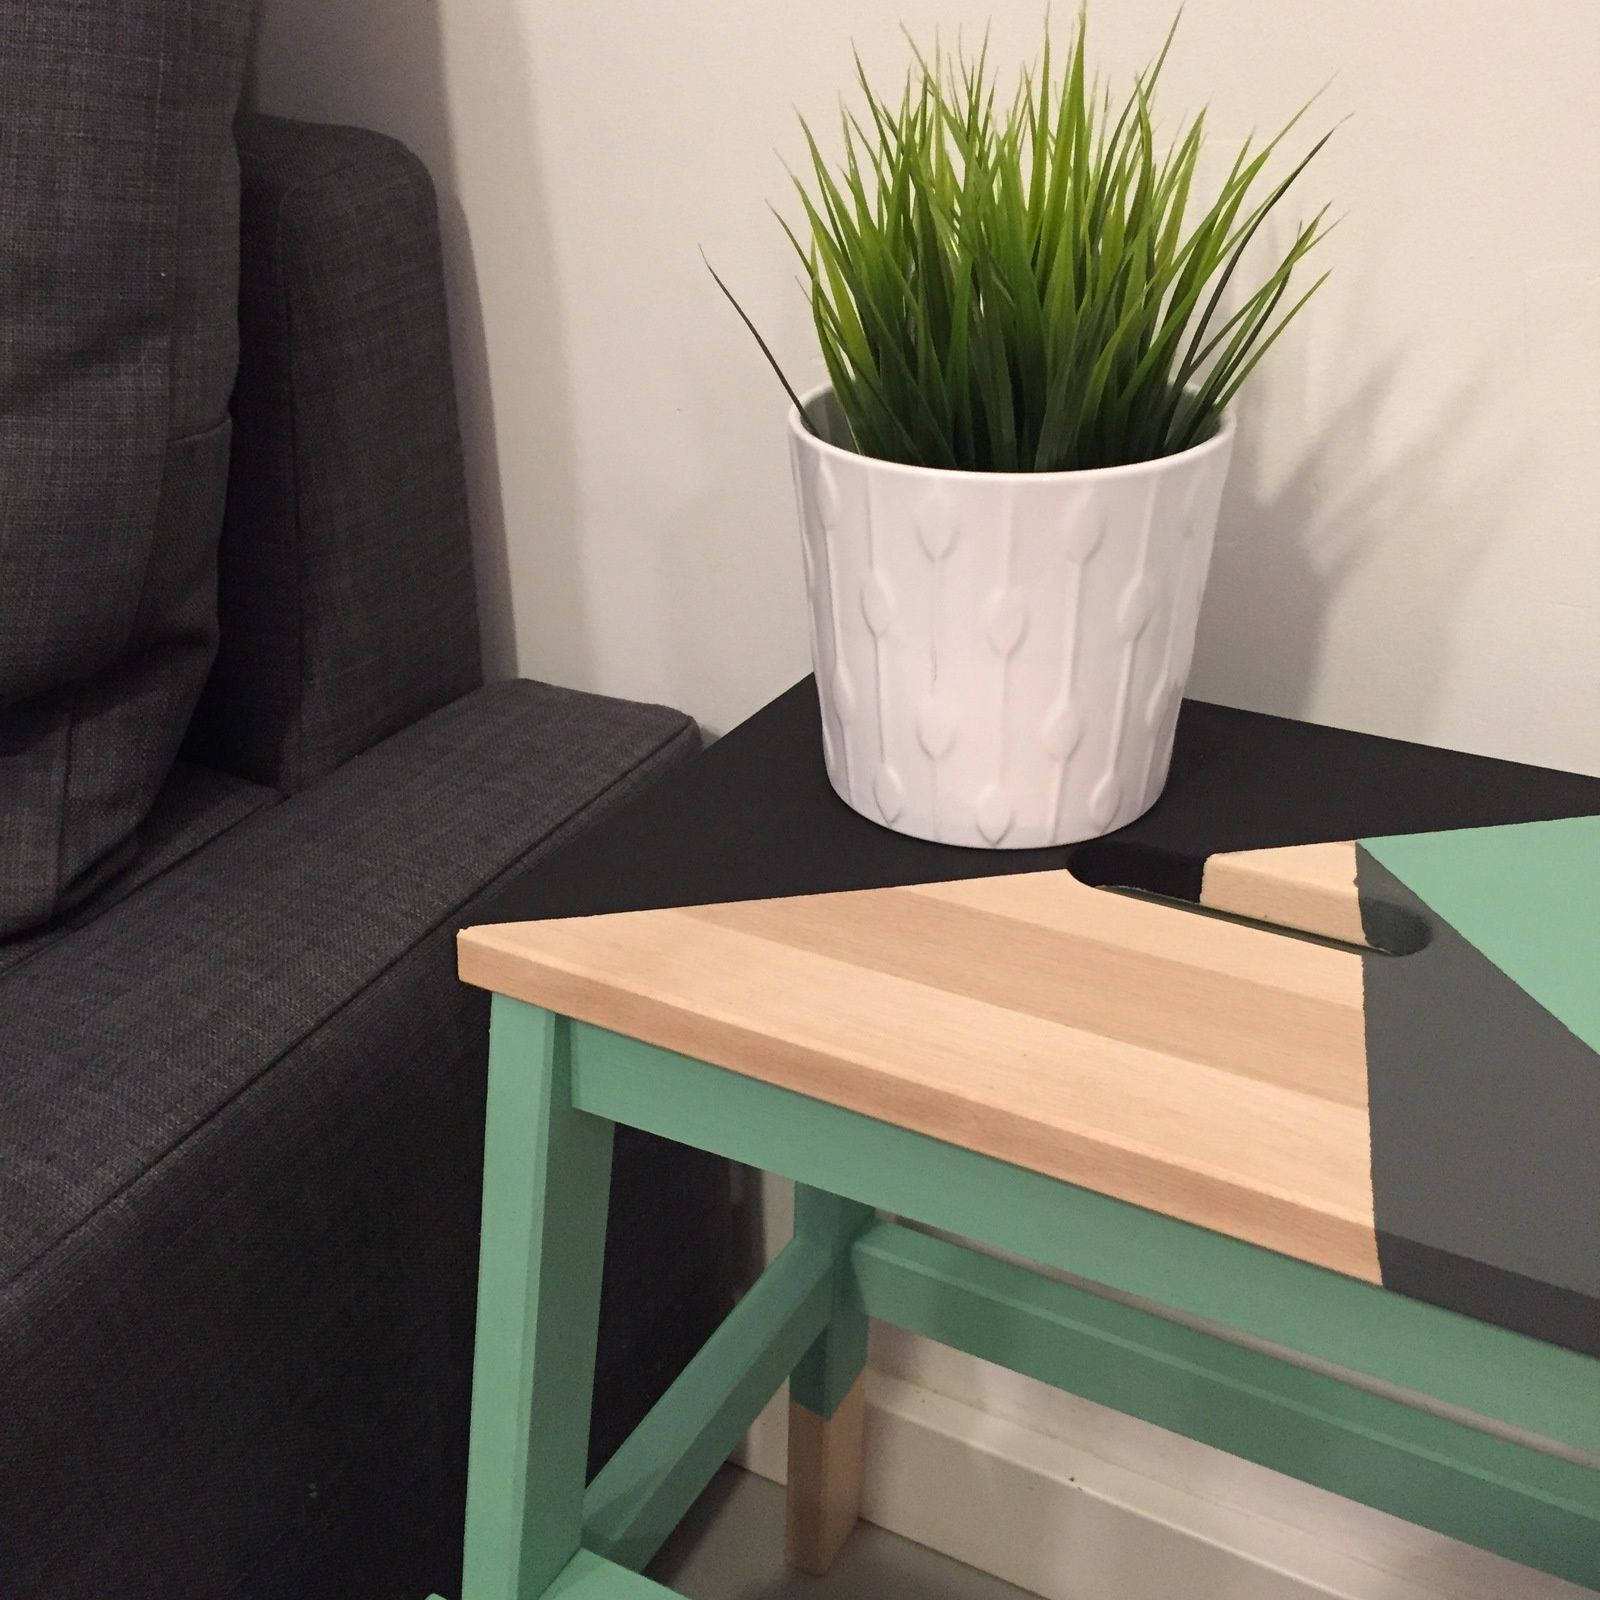 le marchepied ikea bekvam gagner ikea pinterest cuarto ni a. Black Bedroom Furniture Sets. Home Design Ideas